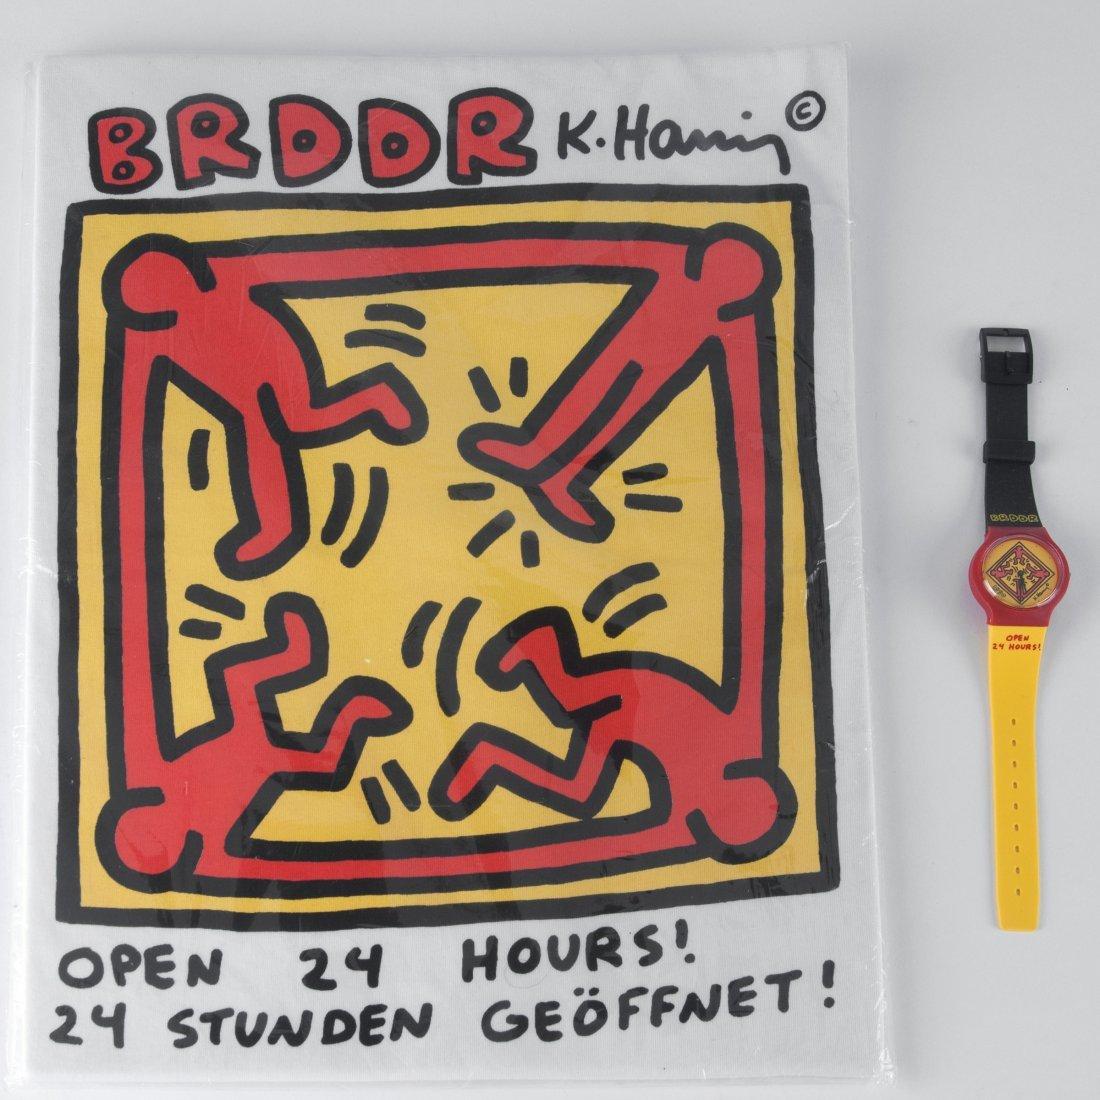 'BRDDR' watch and T shirt, 1990 - 3